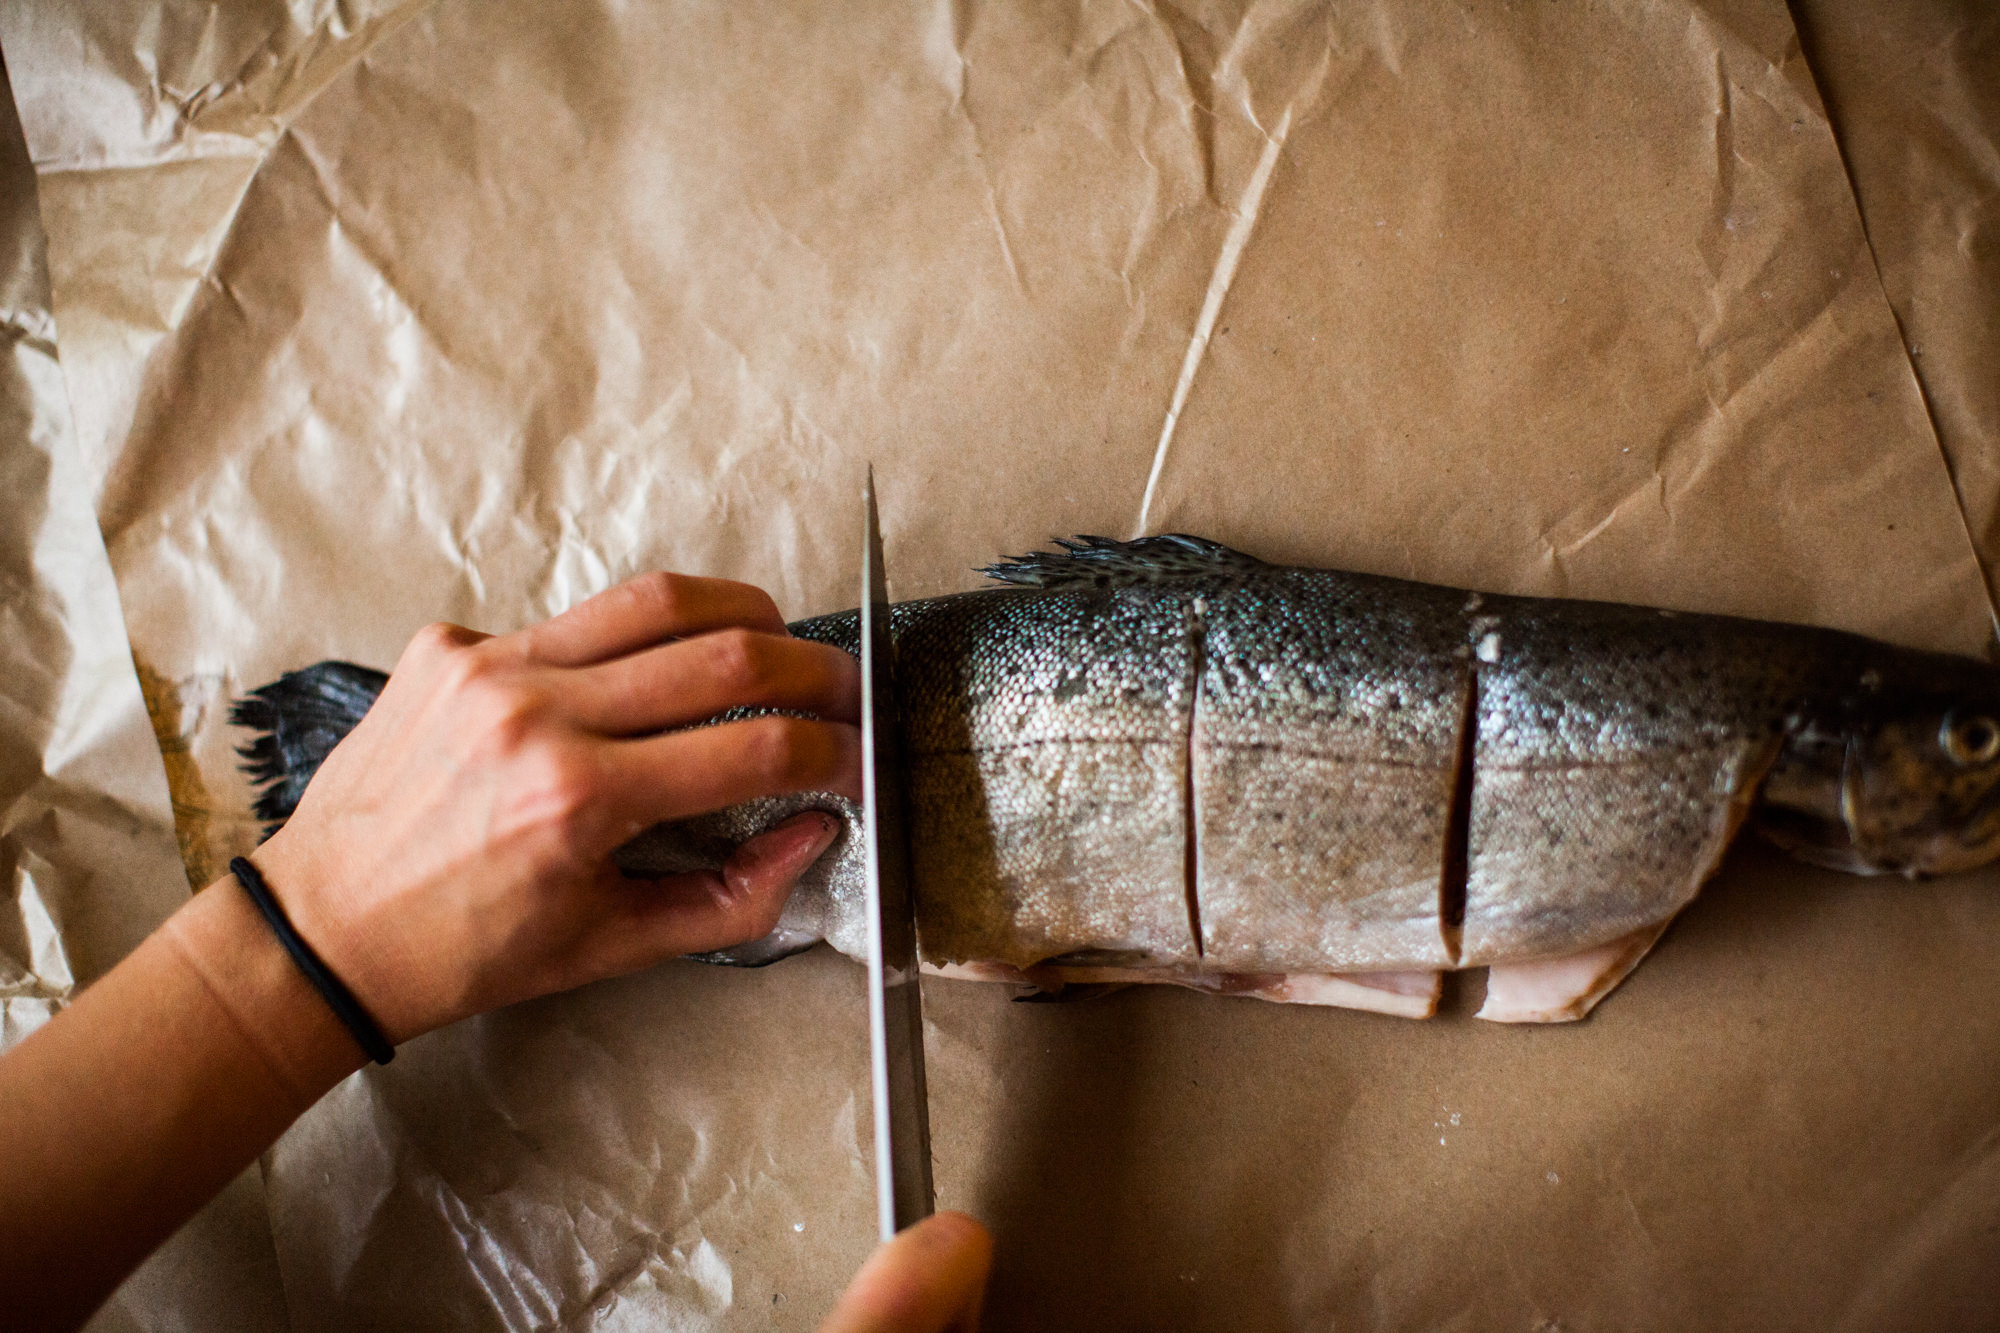 fondlife_rainbow_trout_recipe-6.jpg